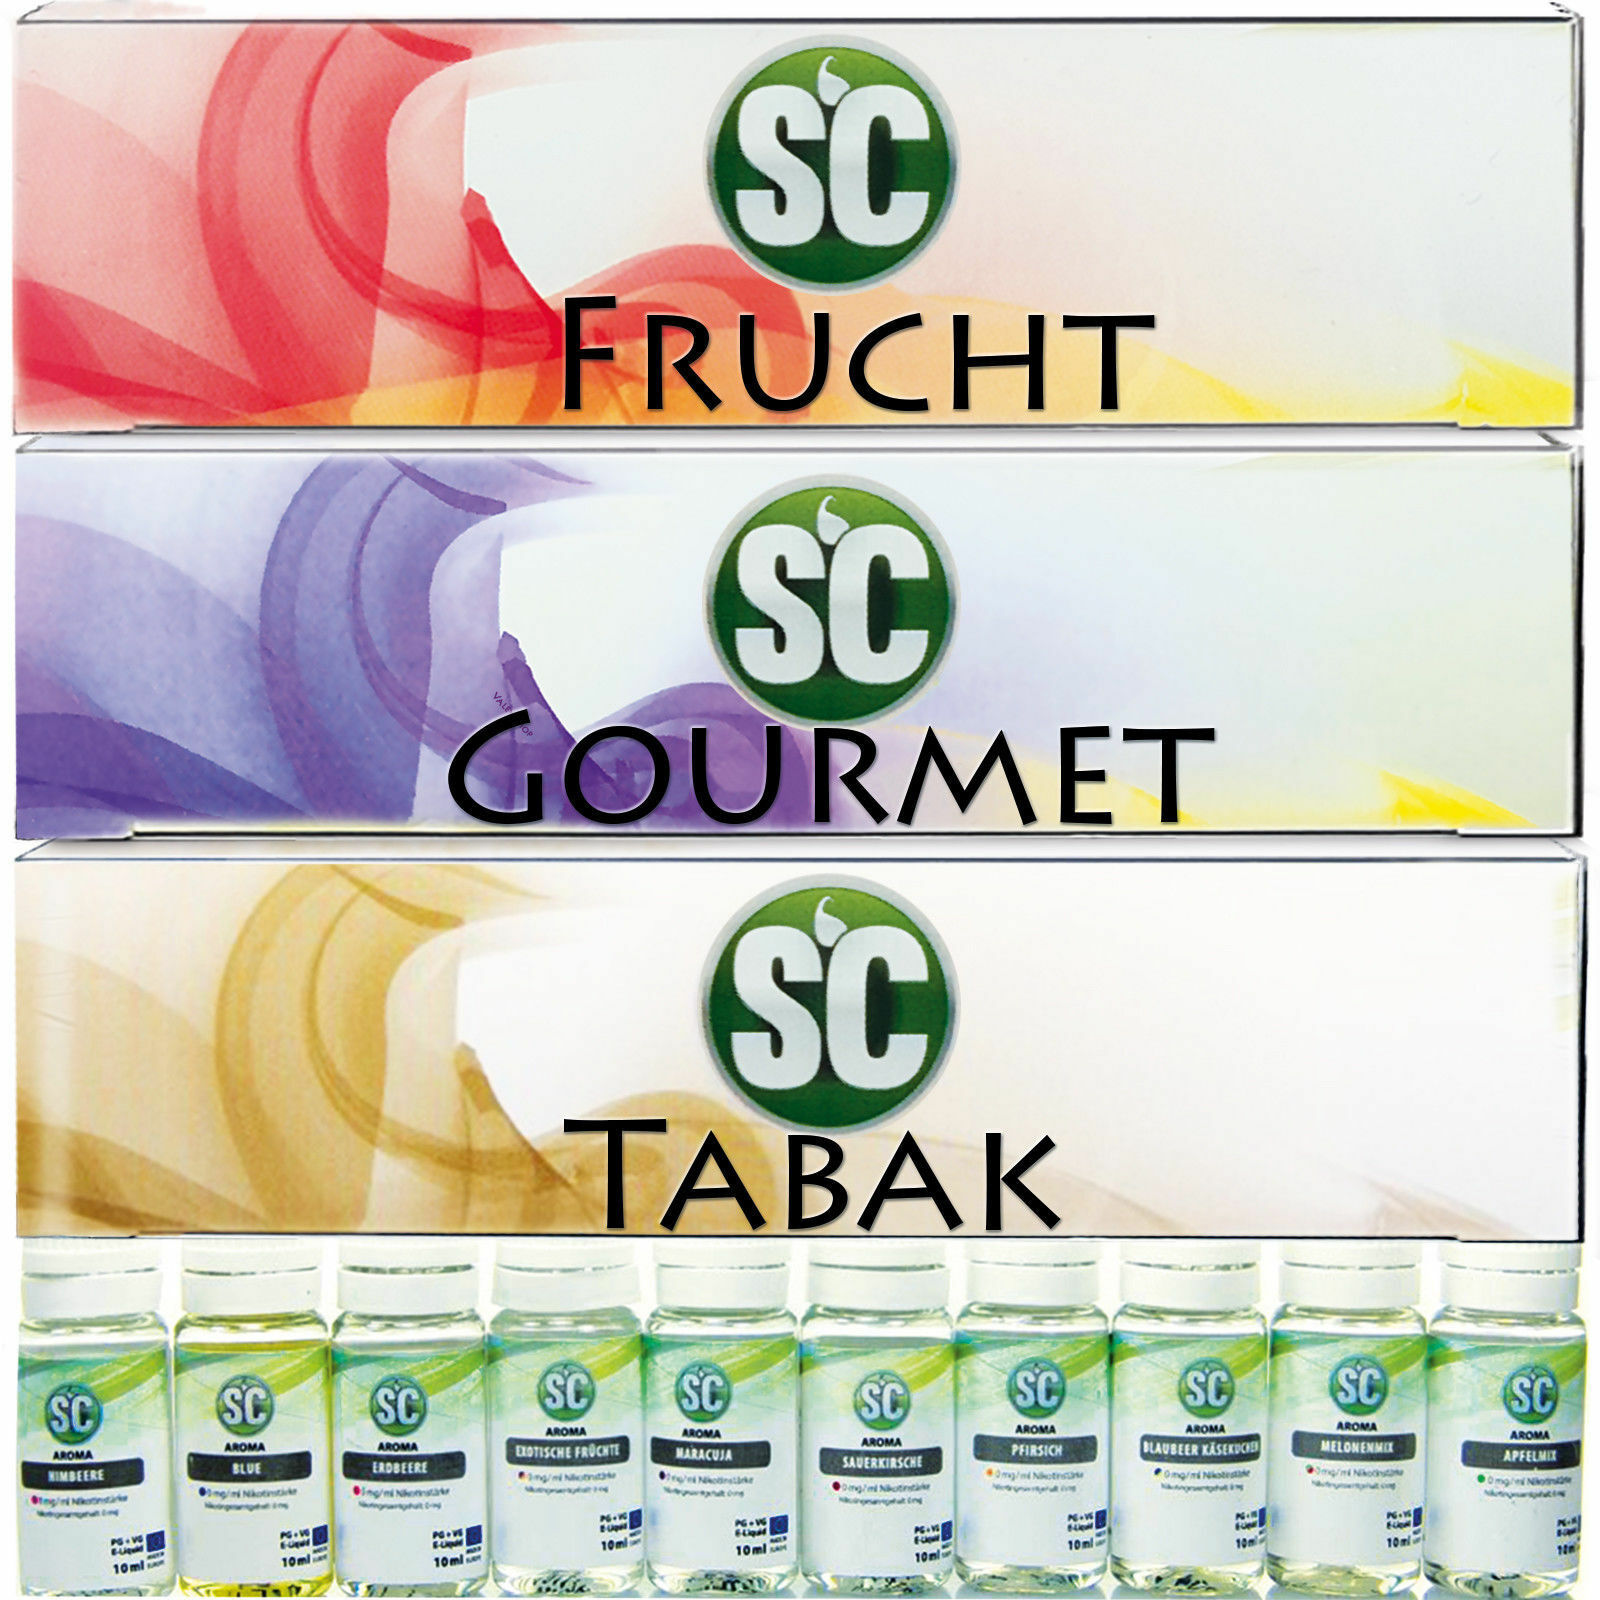 SC Liquid Probierbox 10x 10ml E-Zigarette E-Liquid Liquids Frucht Gourmet Tabak